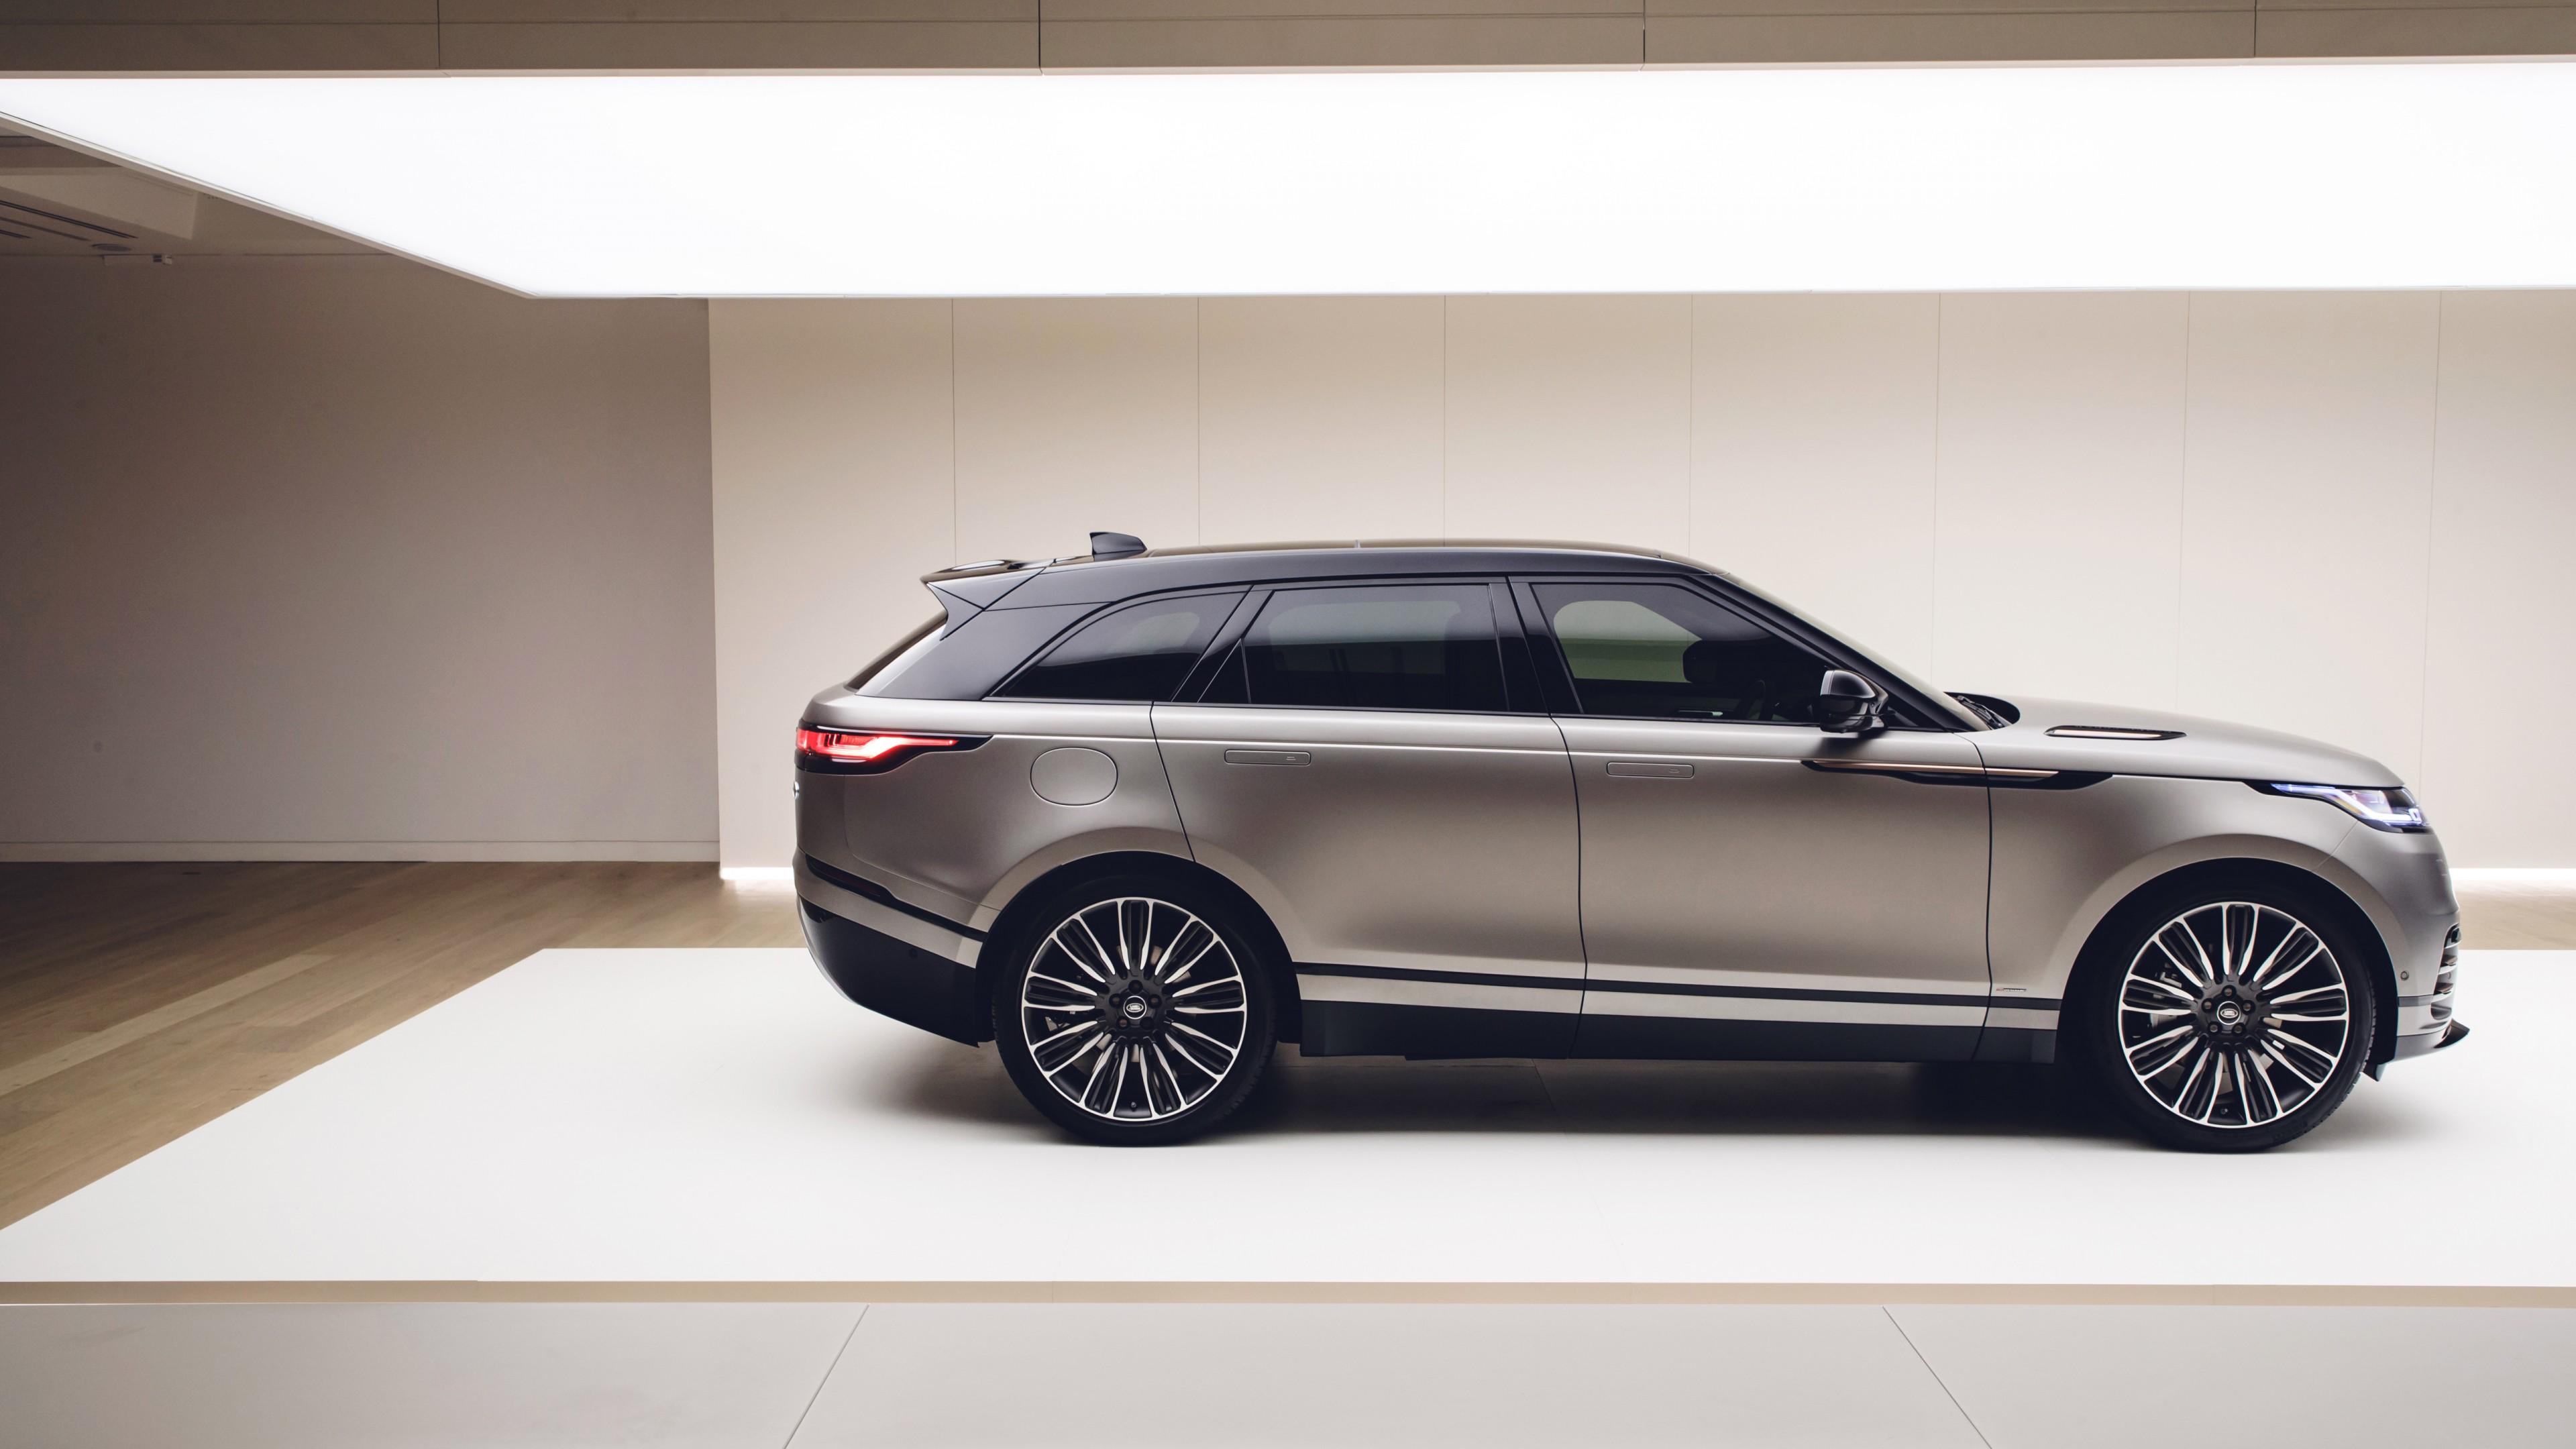 Iphone X Dynamic Wallpaper Download 2018 Range Rover Velar 5k Wallpaper Hd Car Wallpapers